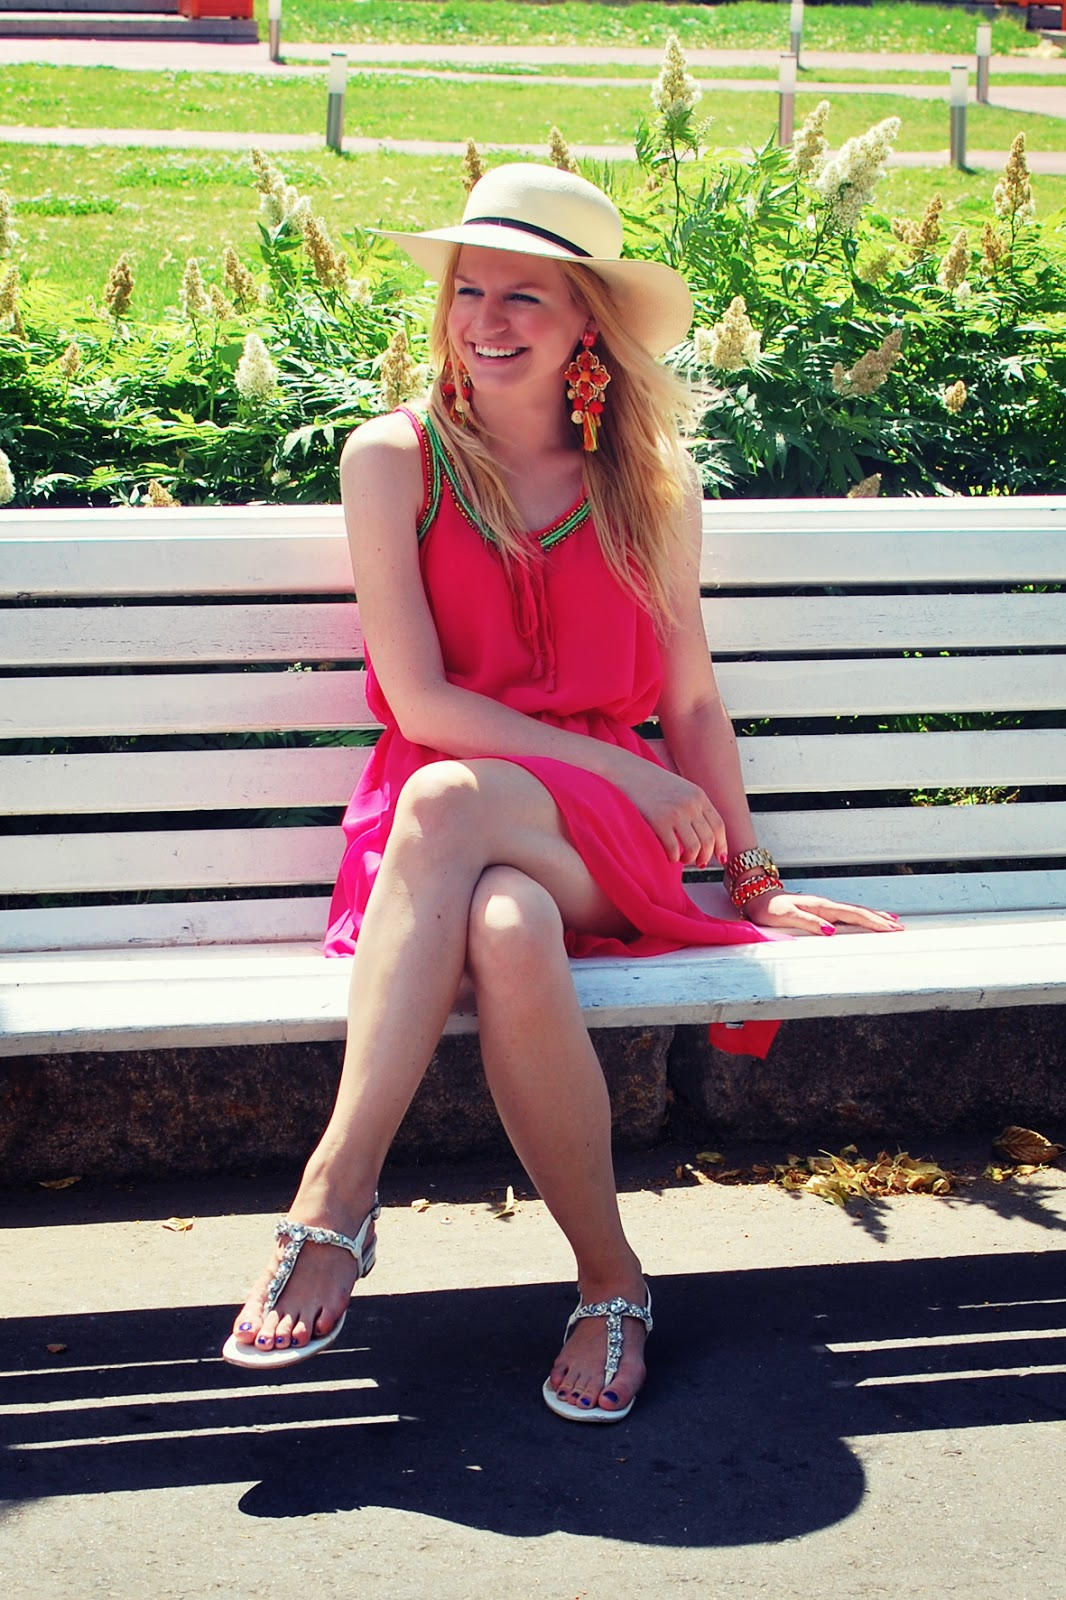 summer look, summer hat, модные шляпы, летние шляпы, летние луки,Ирина Павлова блог